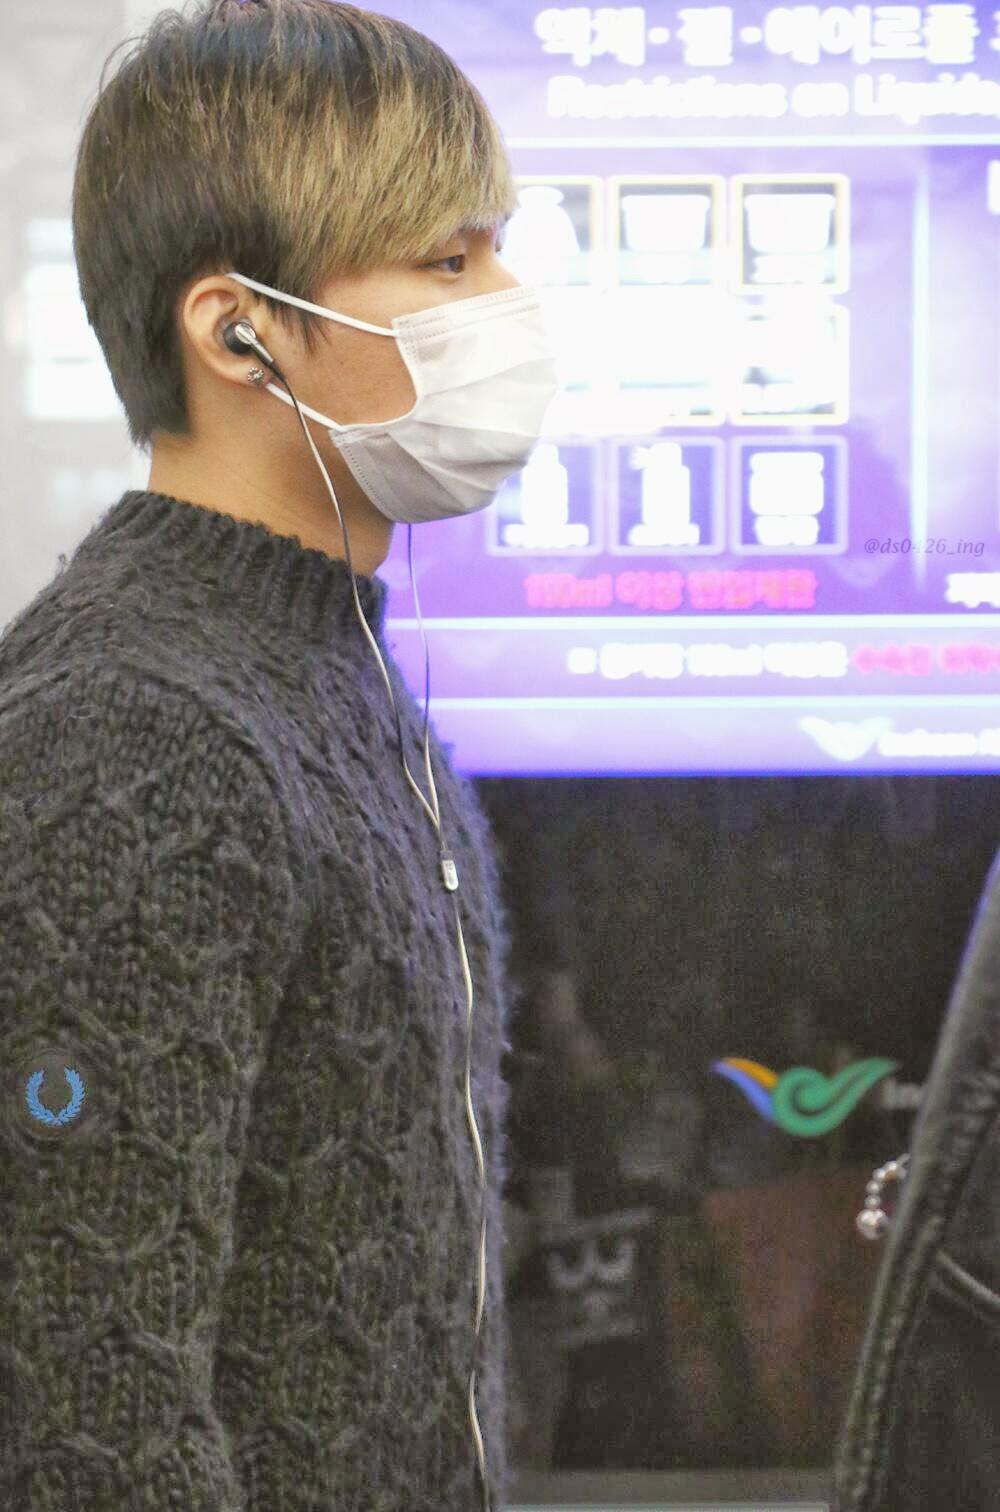 Big Bang - Incheon Airport - 06dec2013 - Dae Sung - Fan - 01.jpg